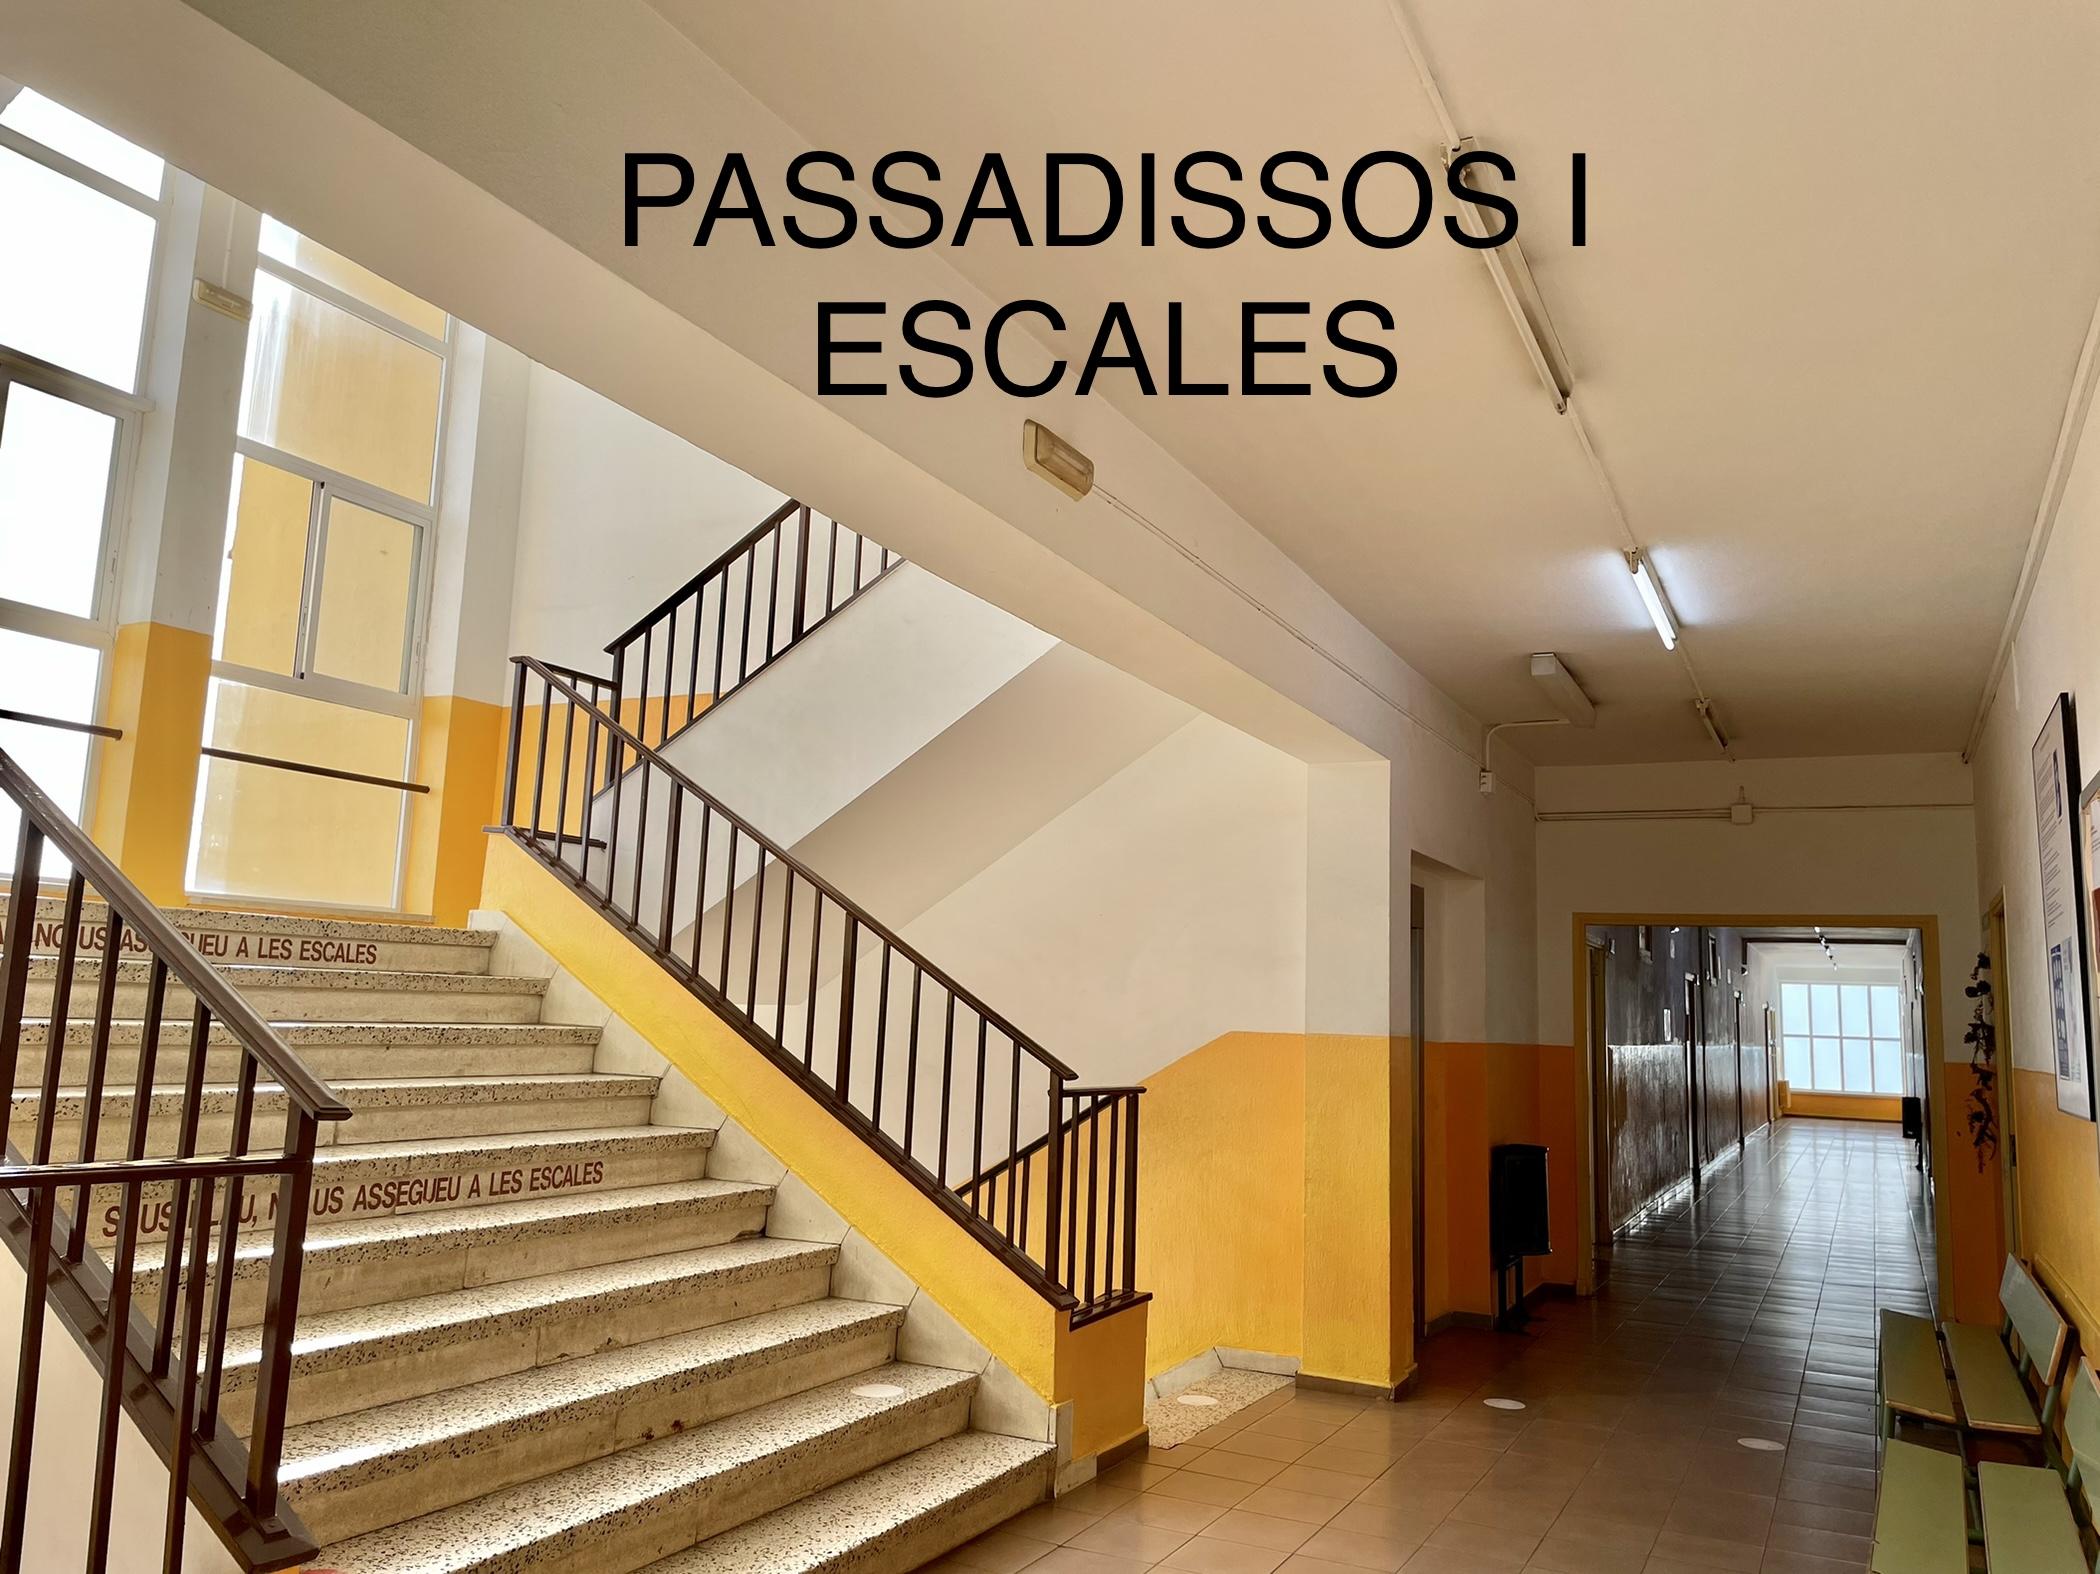 Passadissos i escales